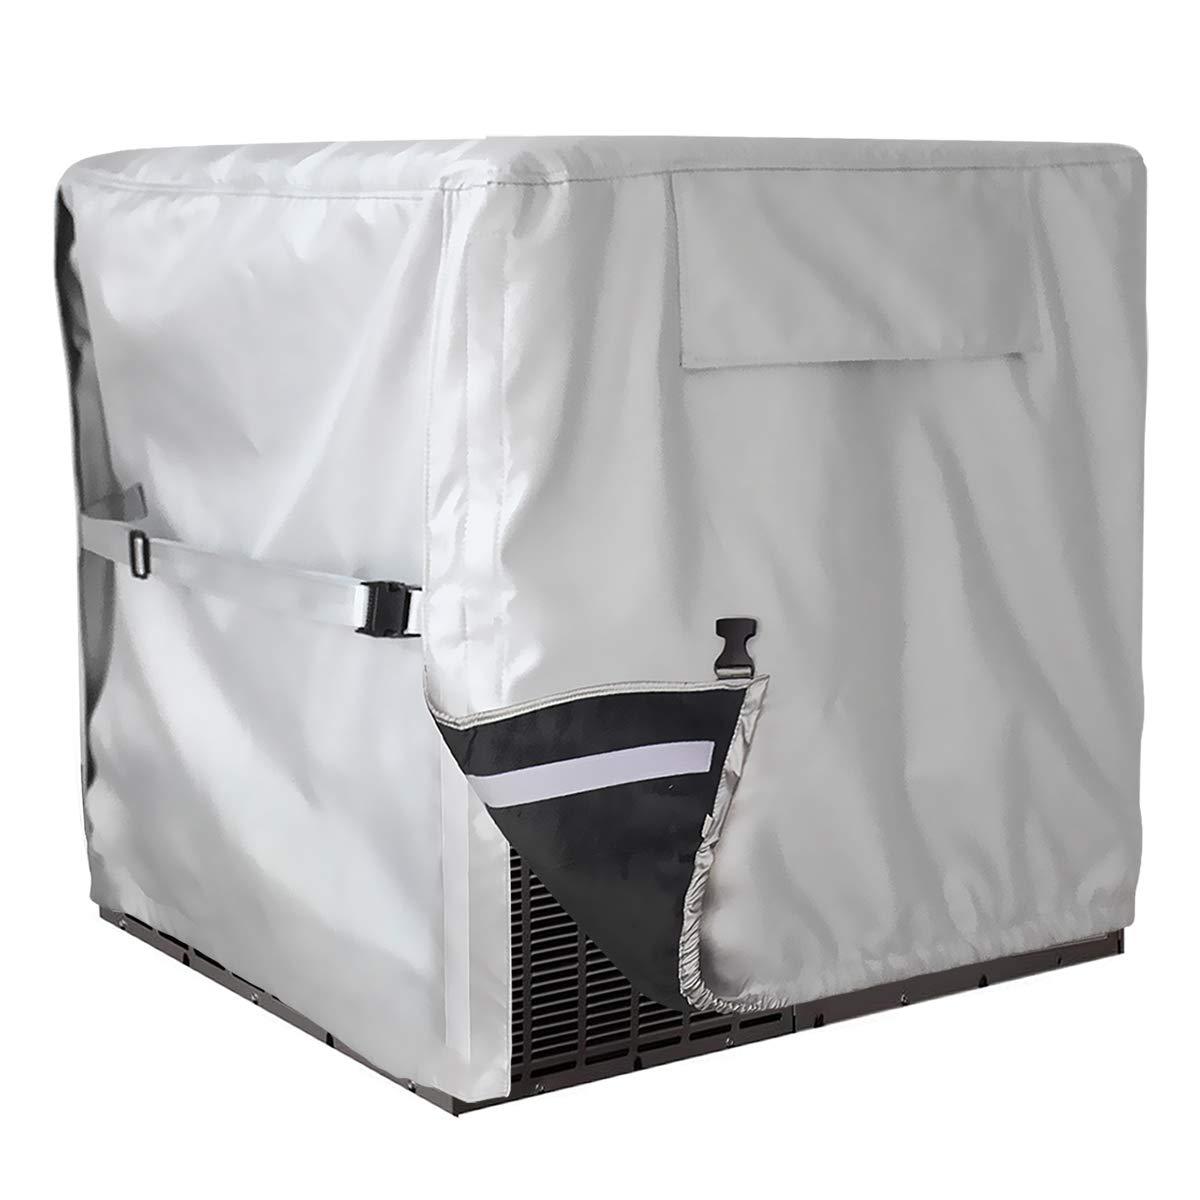 Veranda Air Conditioner AC Units Cover Square Outdoor Protect Waterproof Pebble